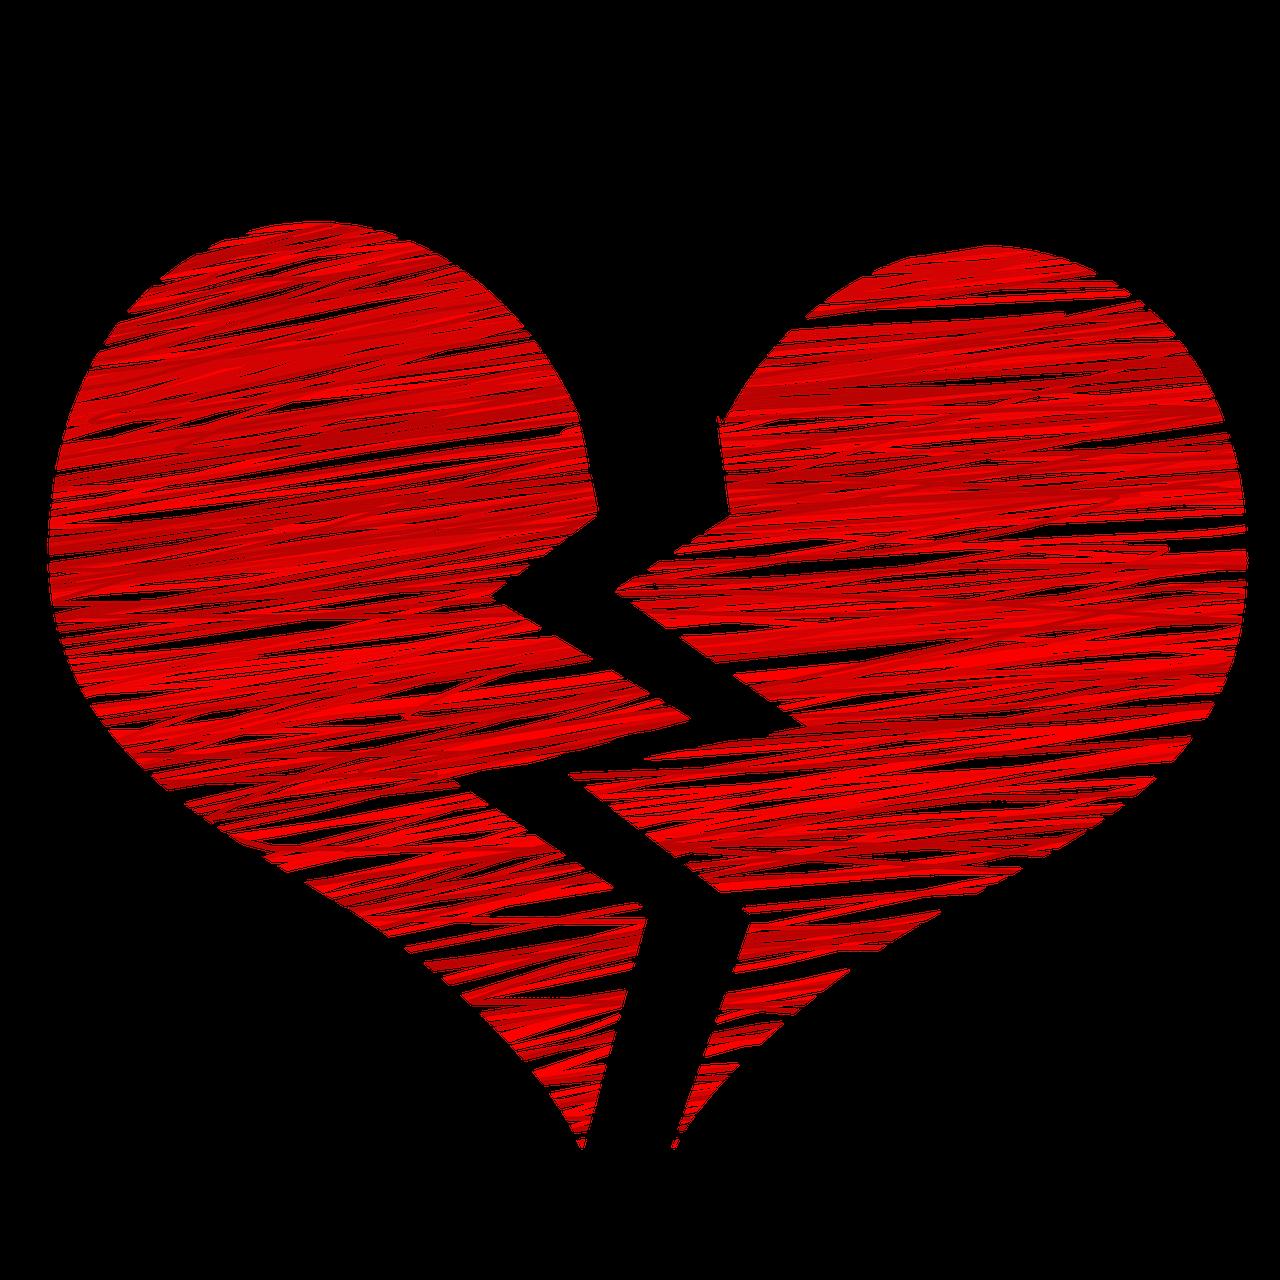 heart-1966018_1280